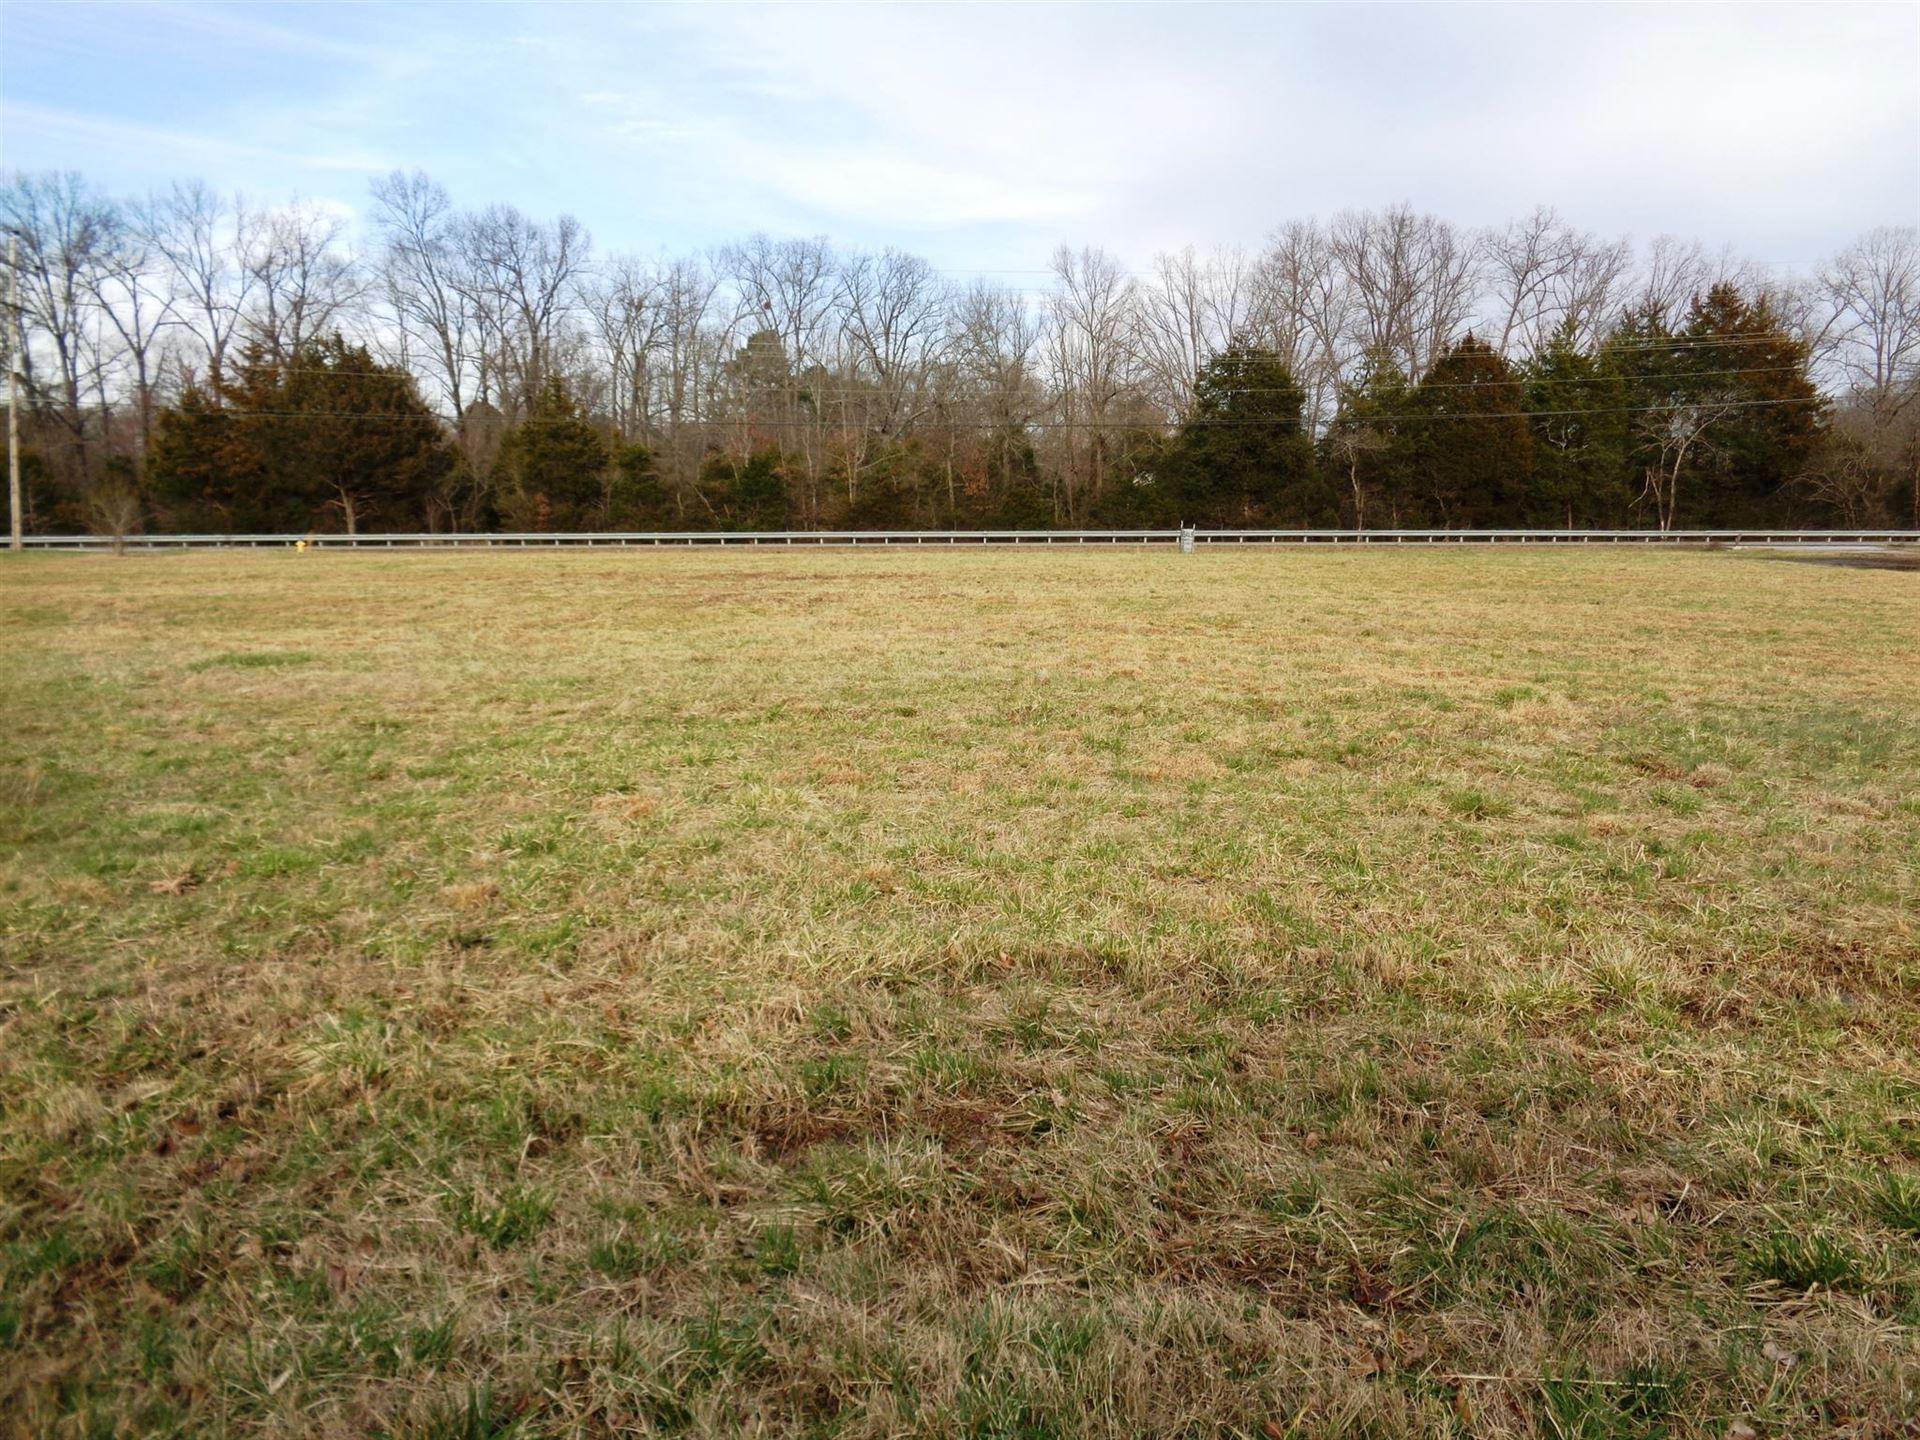 Photo of 1B N Jackson, Tullahoma, TN 37388 (MLS # 1212465)